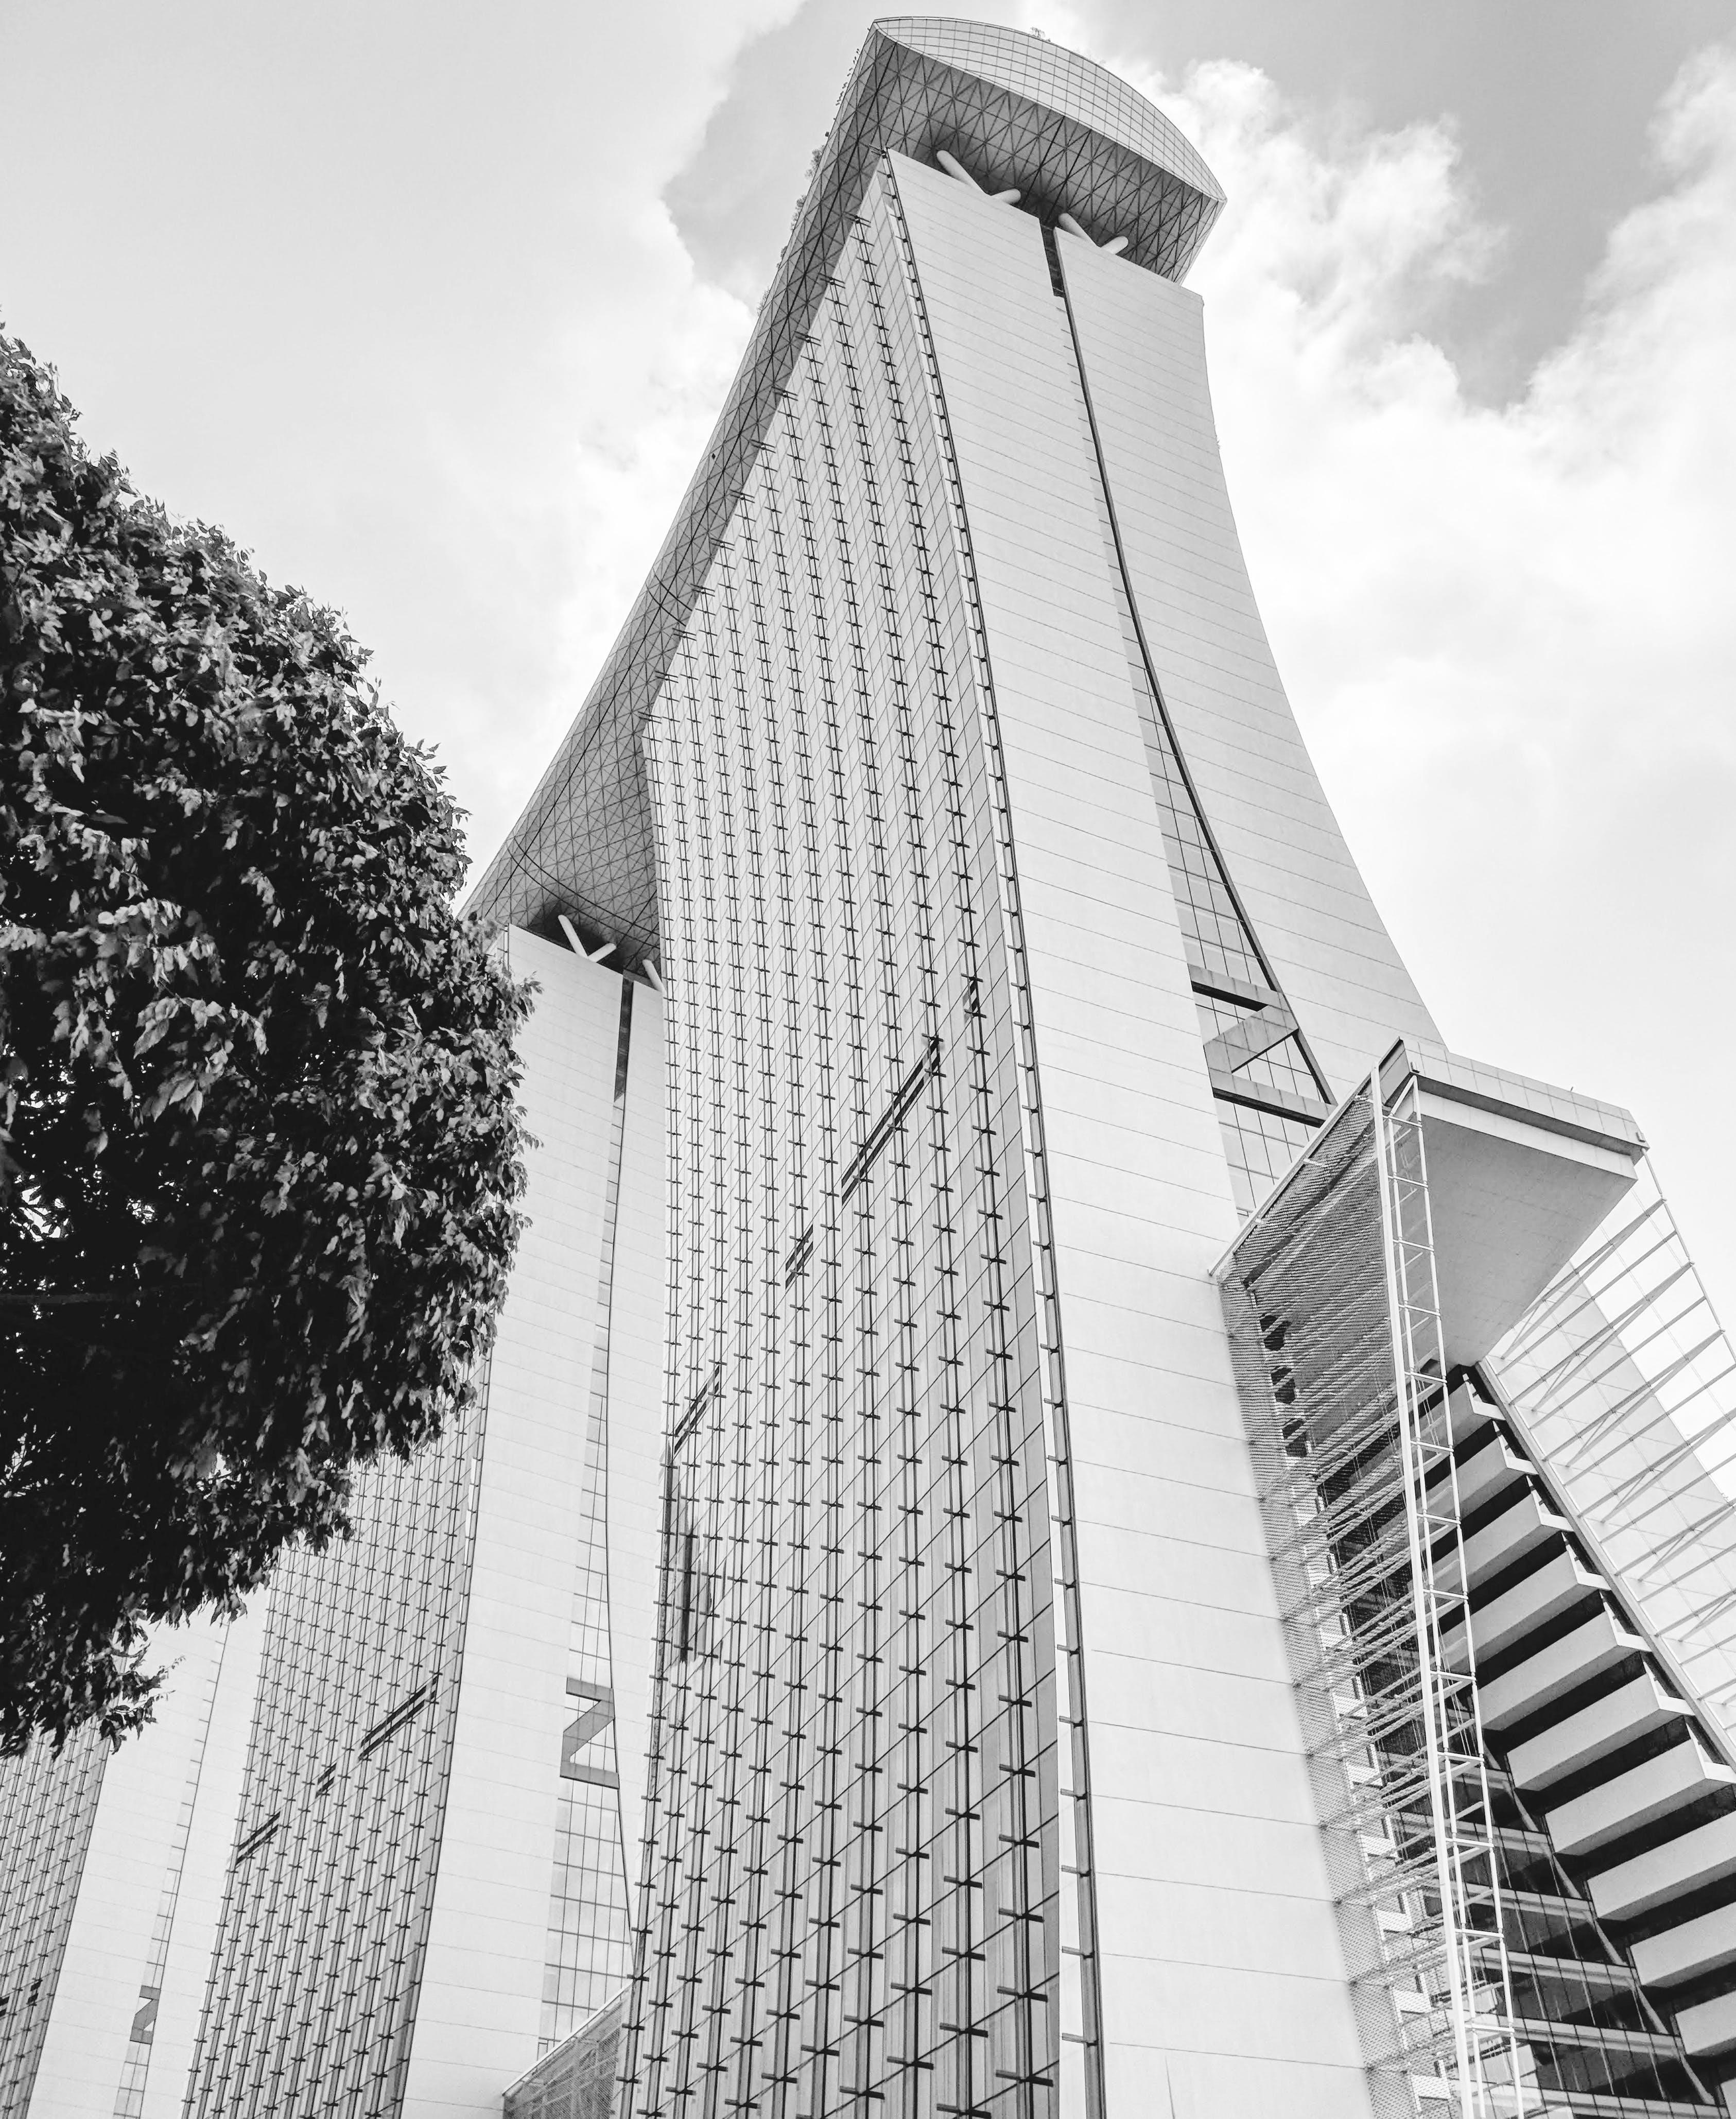 Free stock photo of architectural design, architecture, Asian architecture, black and white